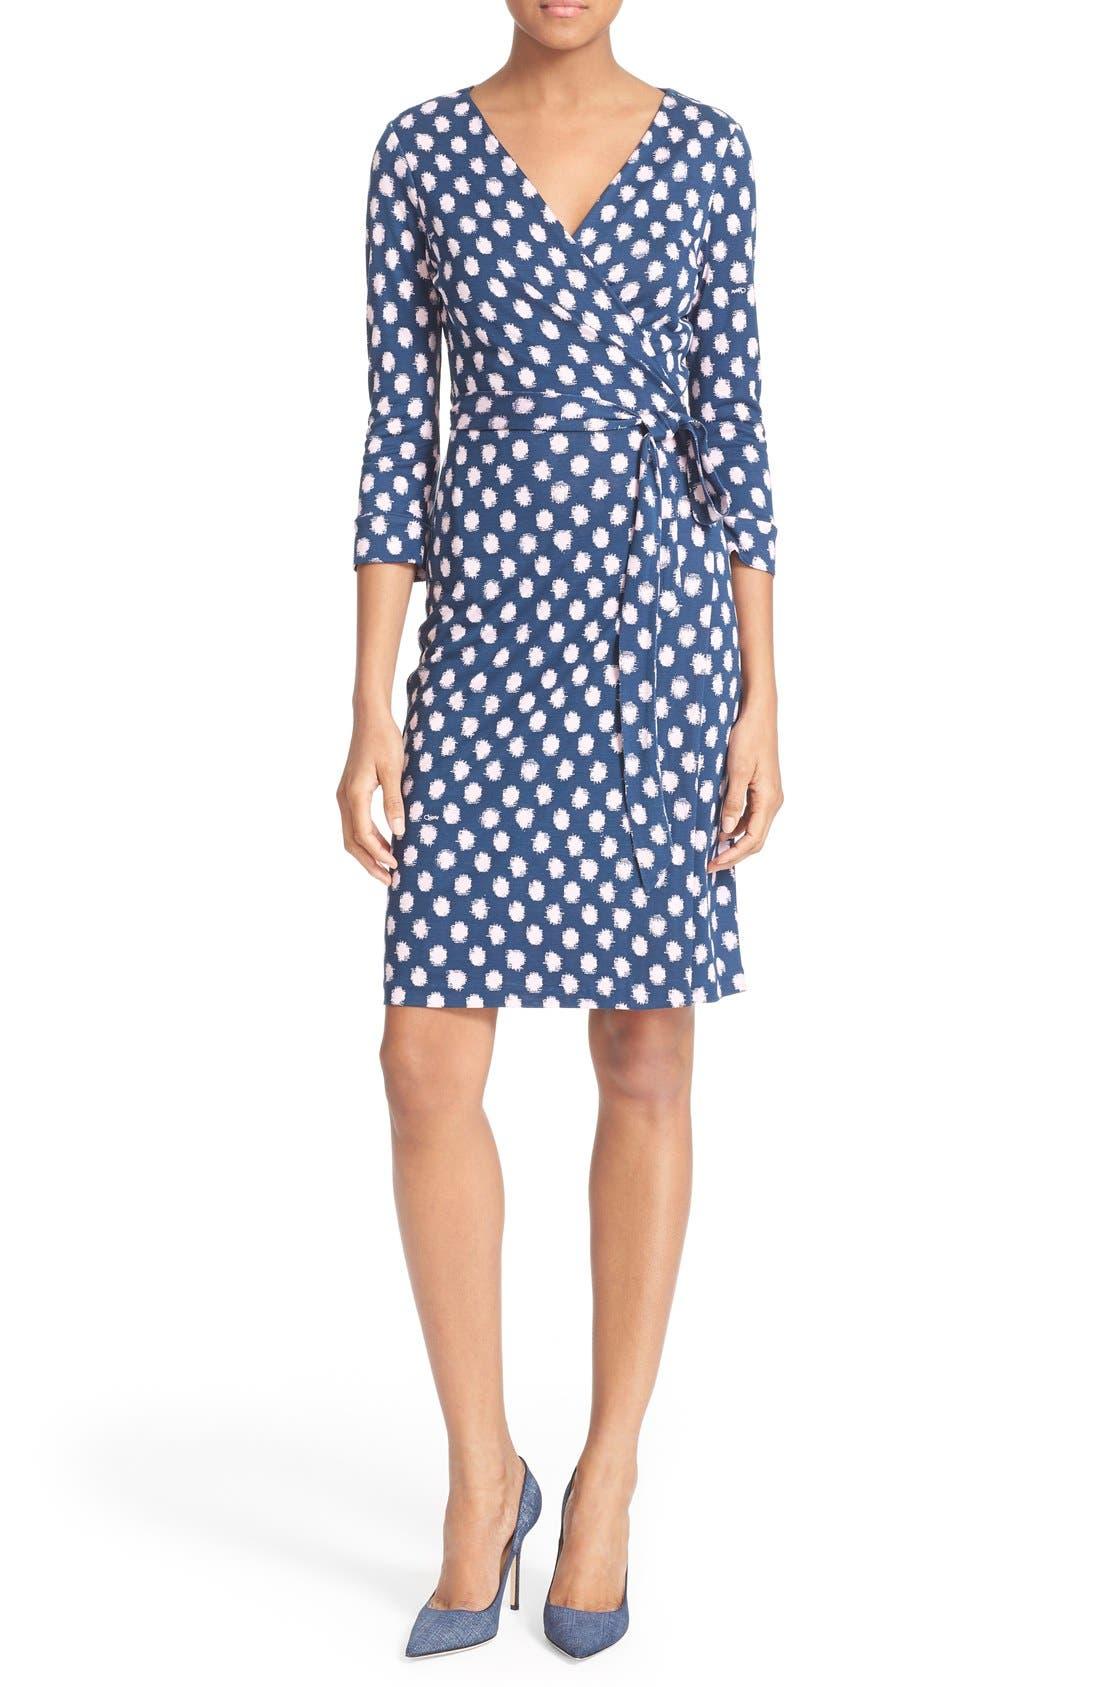 Alternate Image 1 Selected - Diane von Furstenberg 'New Julian Two' Polka Dot Silk Wrap Dress (Nordstrom Exclusive)